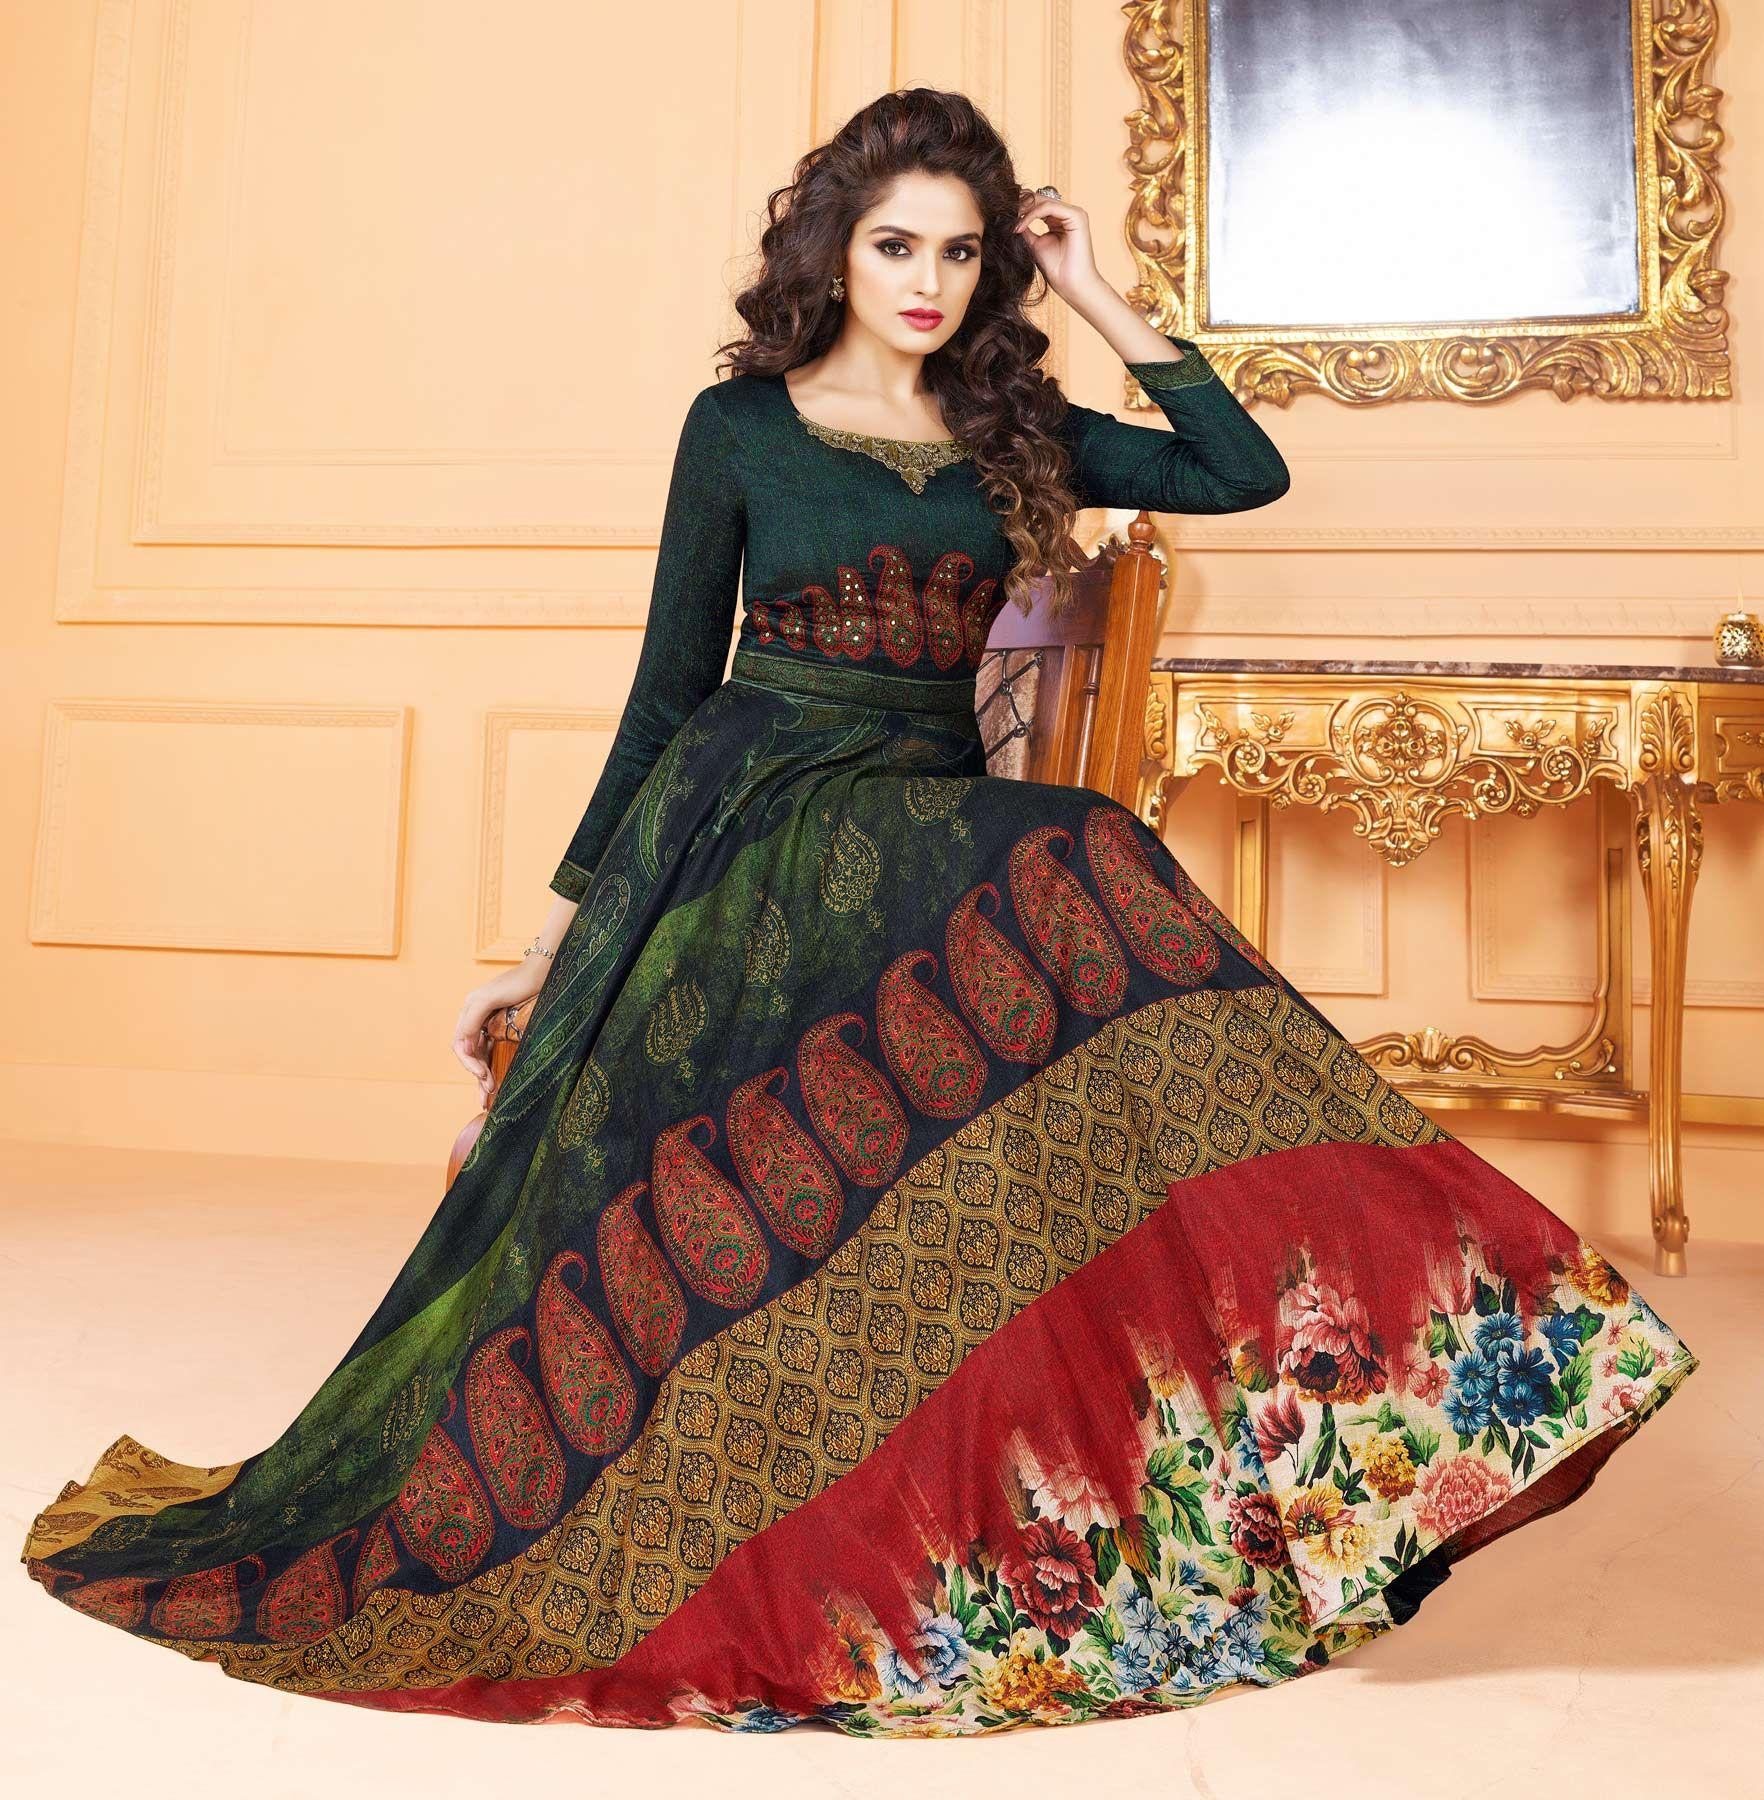 a36da2e5af Stunning Dark Green Colored Partywear Digital Printed Tussar Art Silk Gown